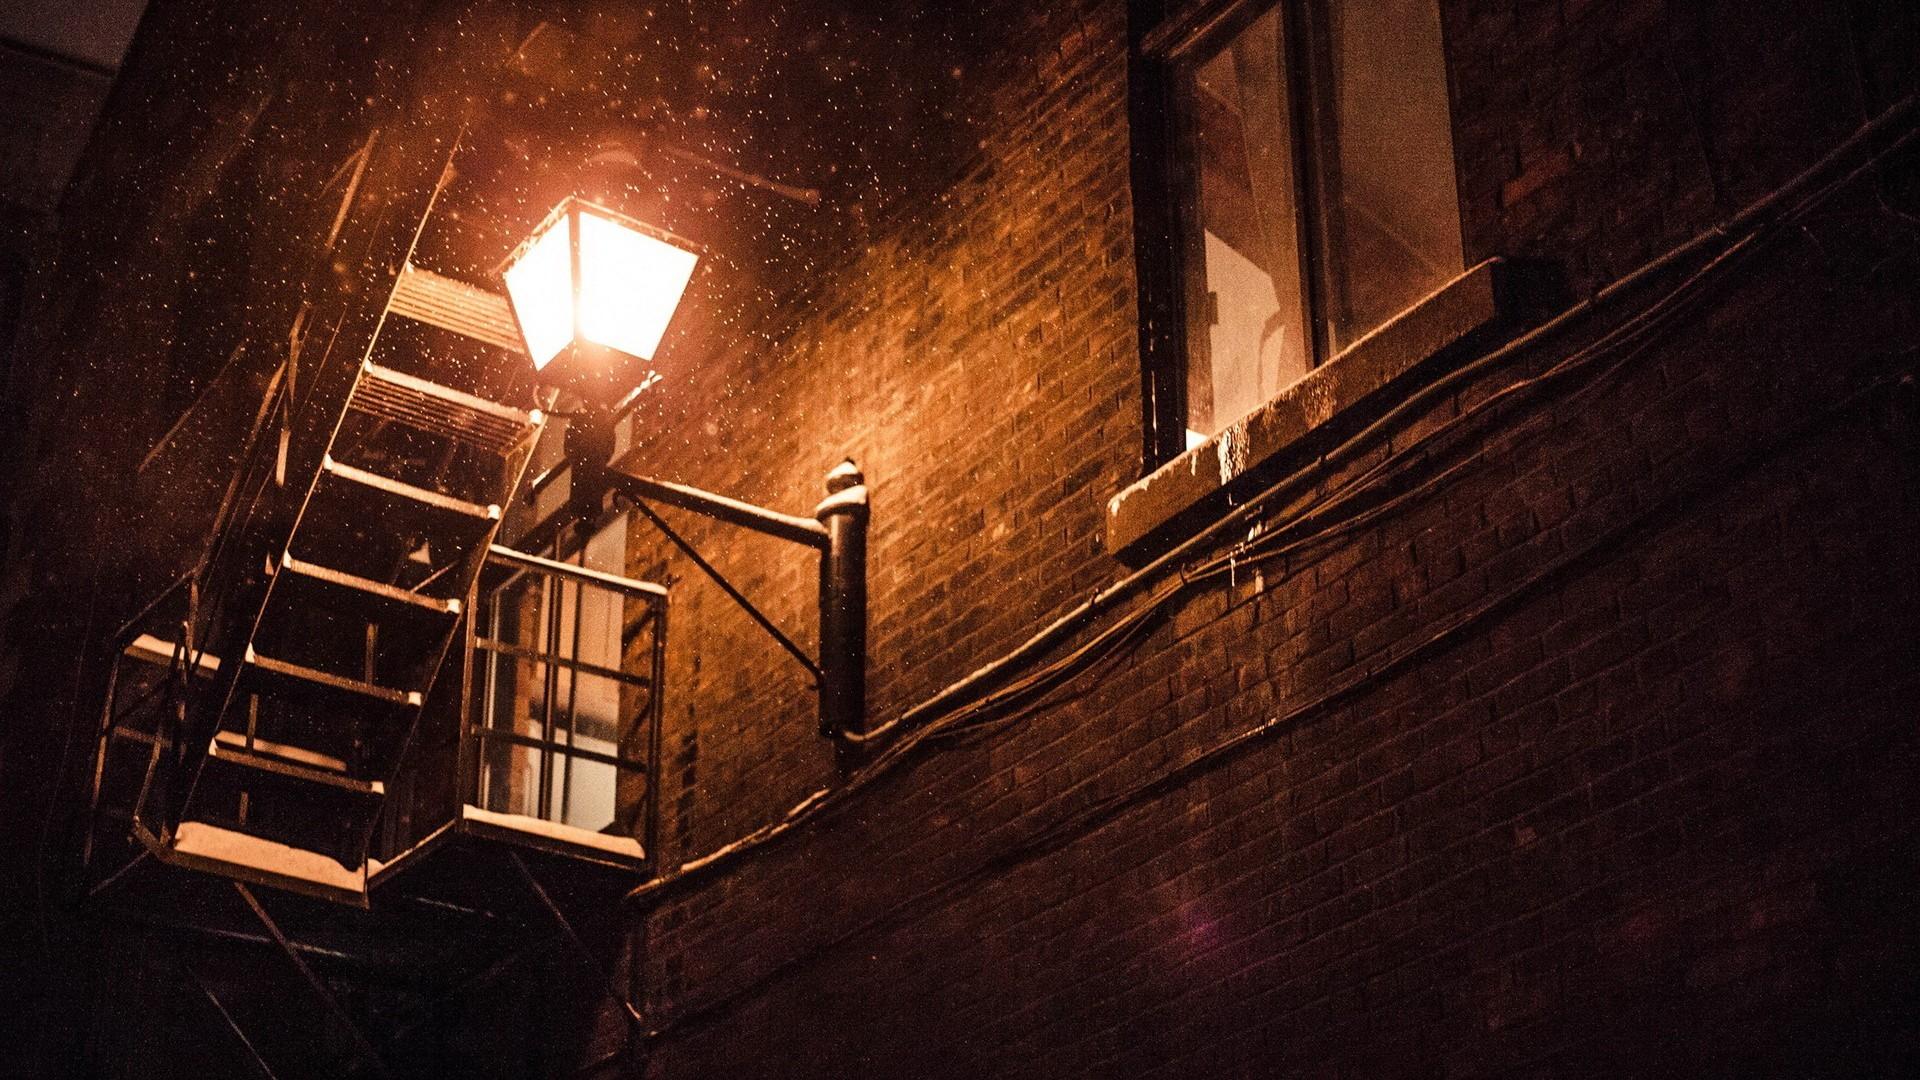 General 1920x1080 photography street street light snow